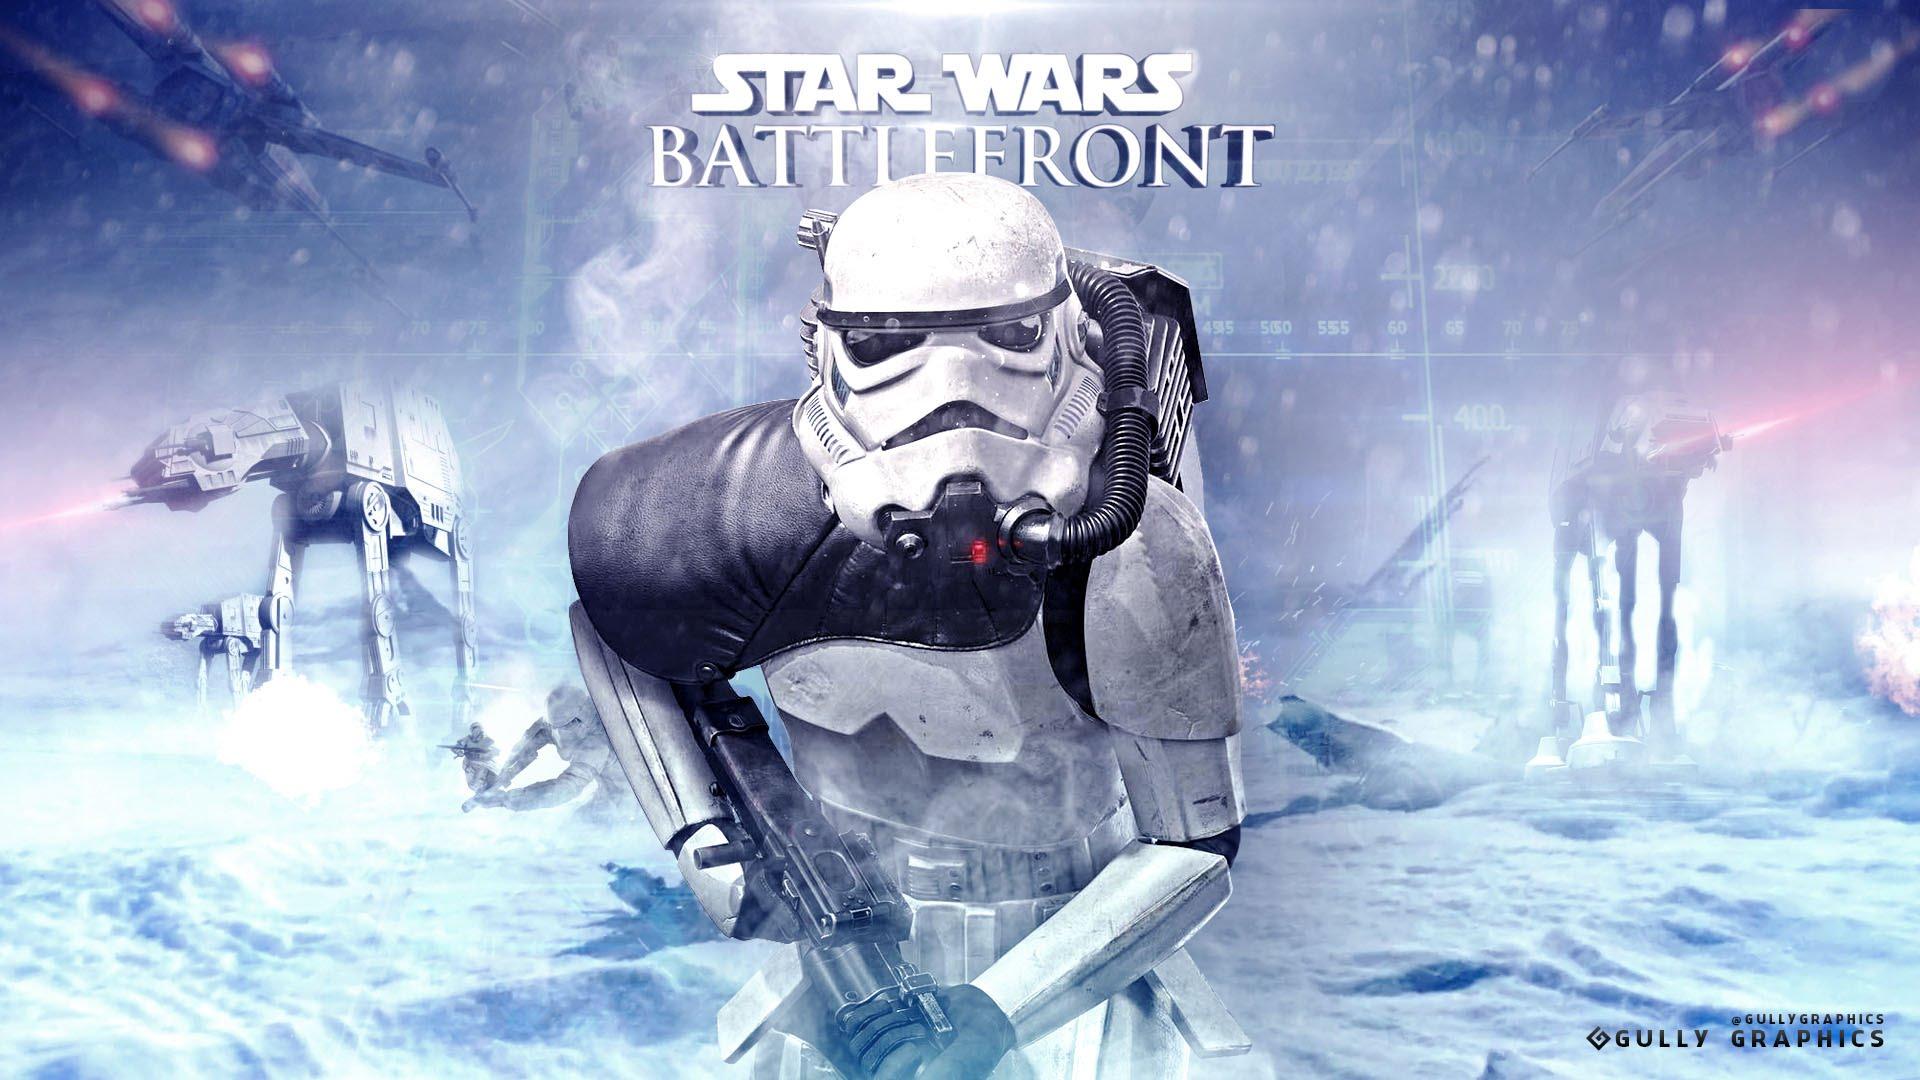 Star Wars Battlefront Wallpaper - YouTube